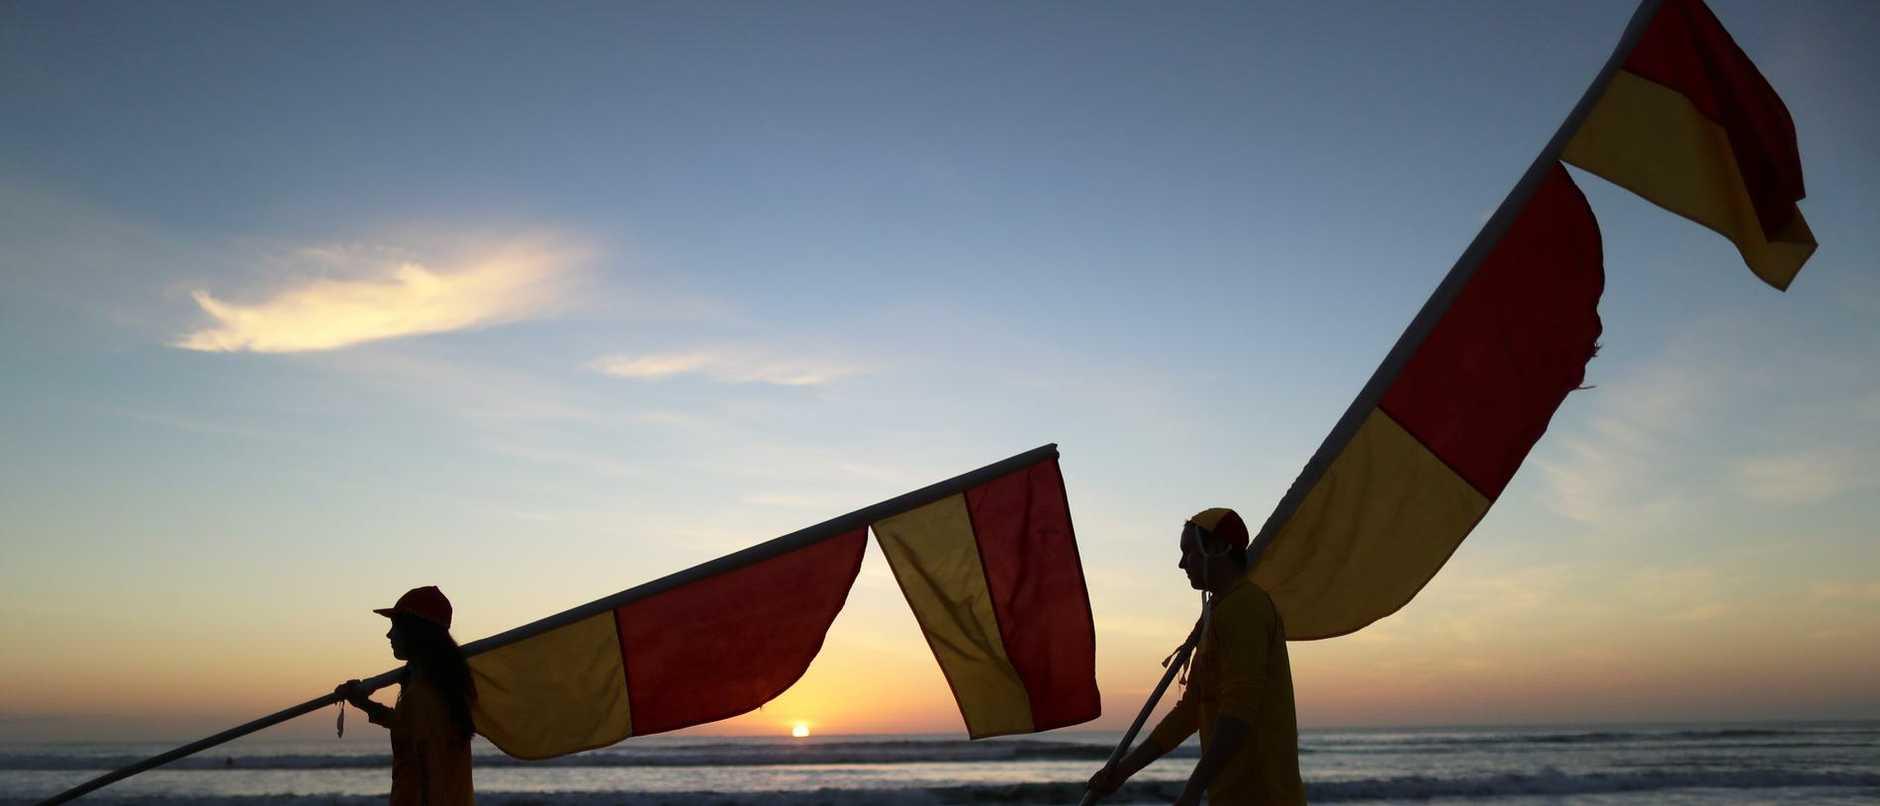 Torquay Surf Life Saving